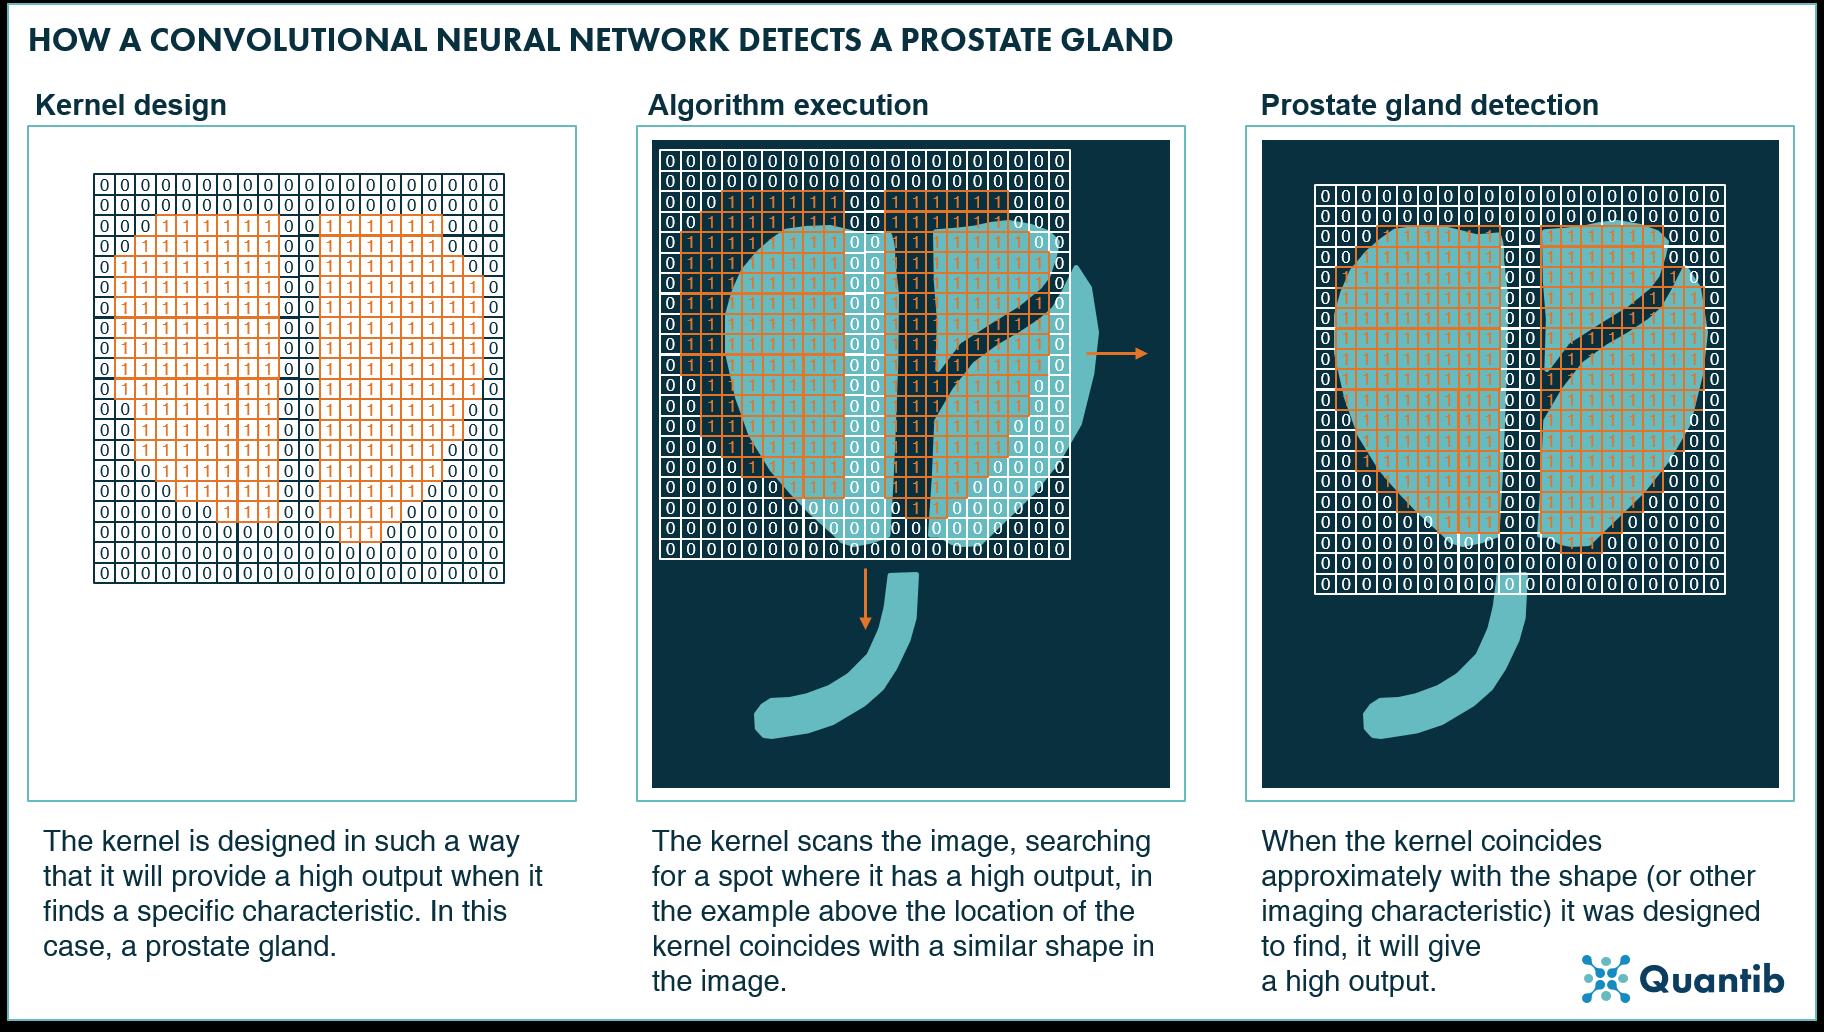 convolutional neural network prostate gland detection